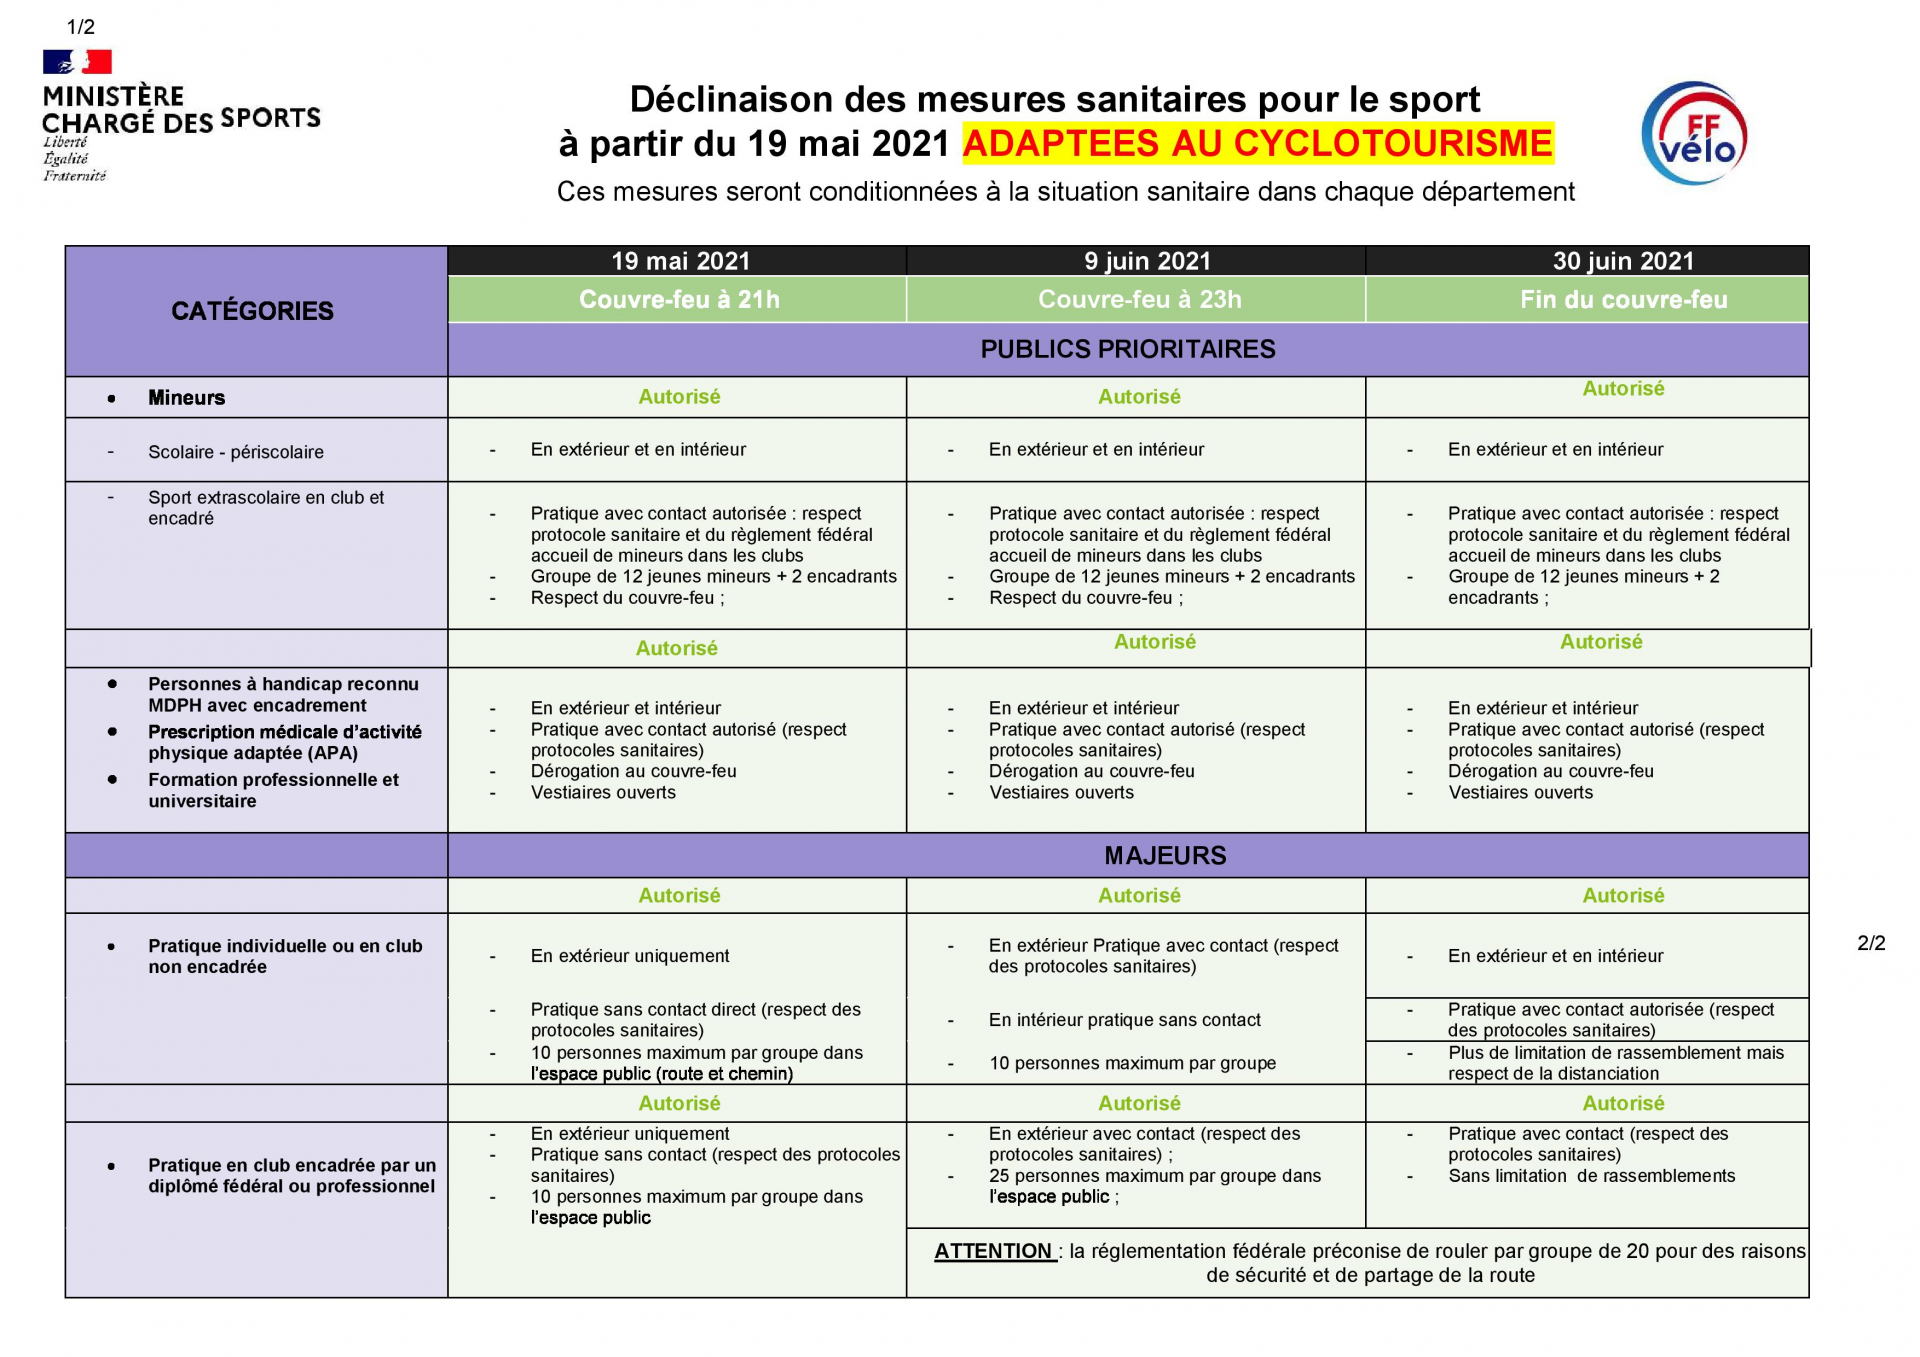 Mesures sanitaires 19 mai 2021